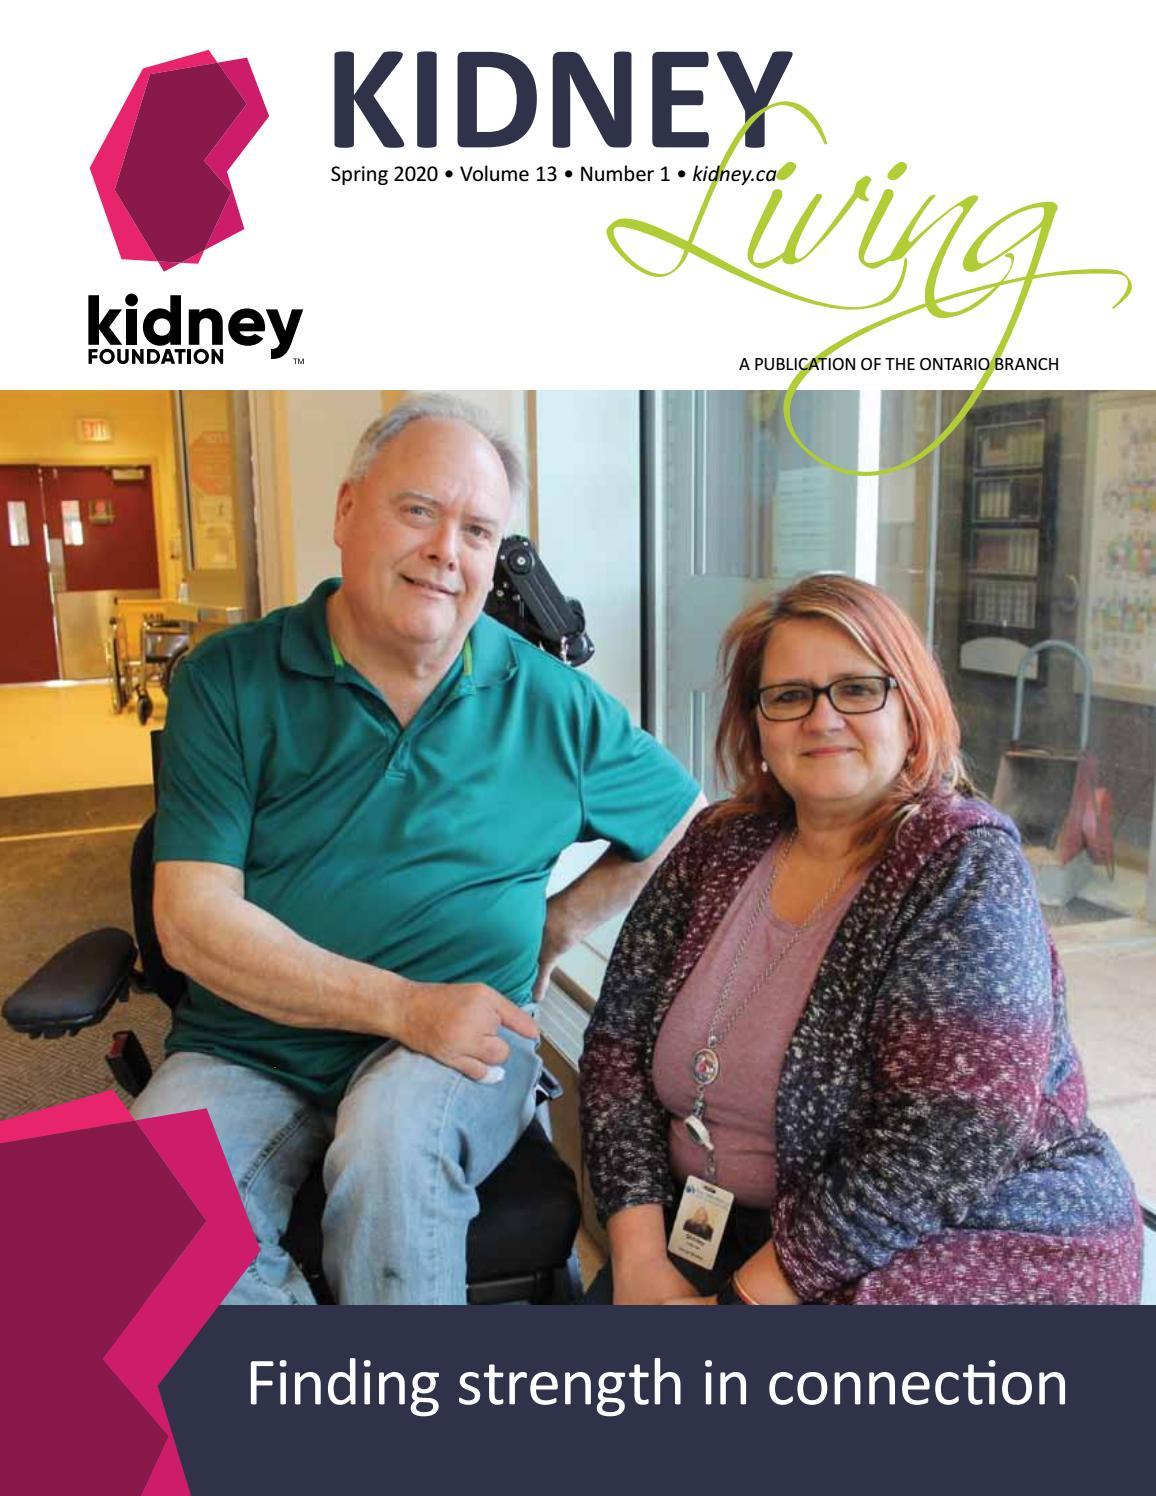 Kidney Living Spring 2020 By The Kidney Foundation La Fondation Du Rein Issuu